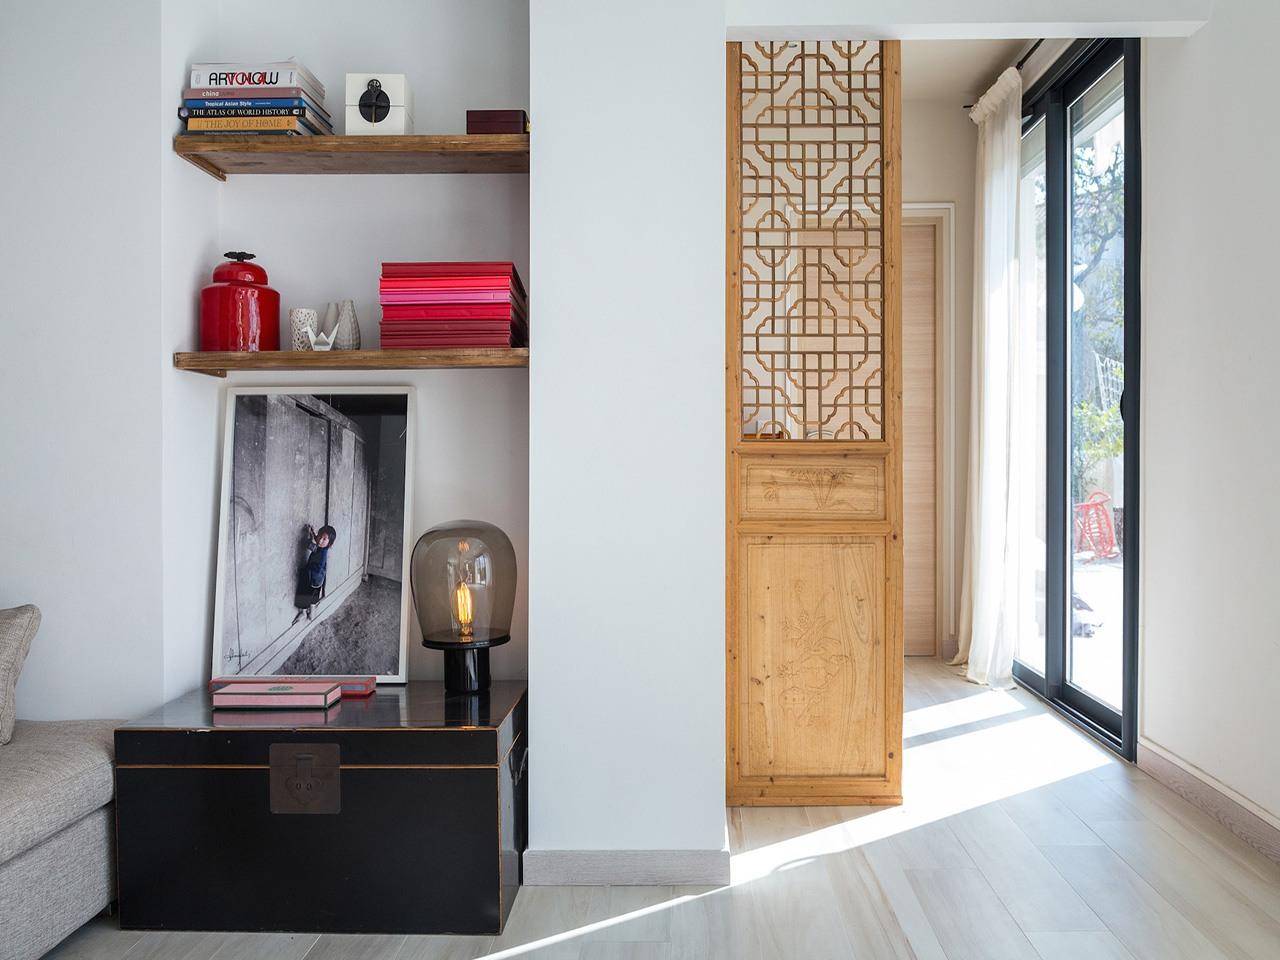 Appartement nice cimiez smaltdesign for Appartement design nice